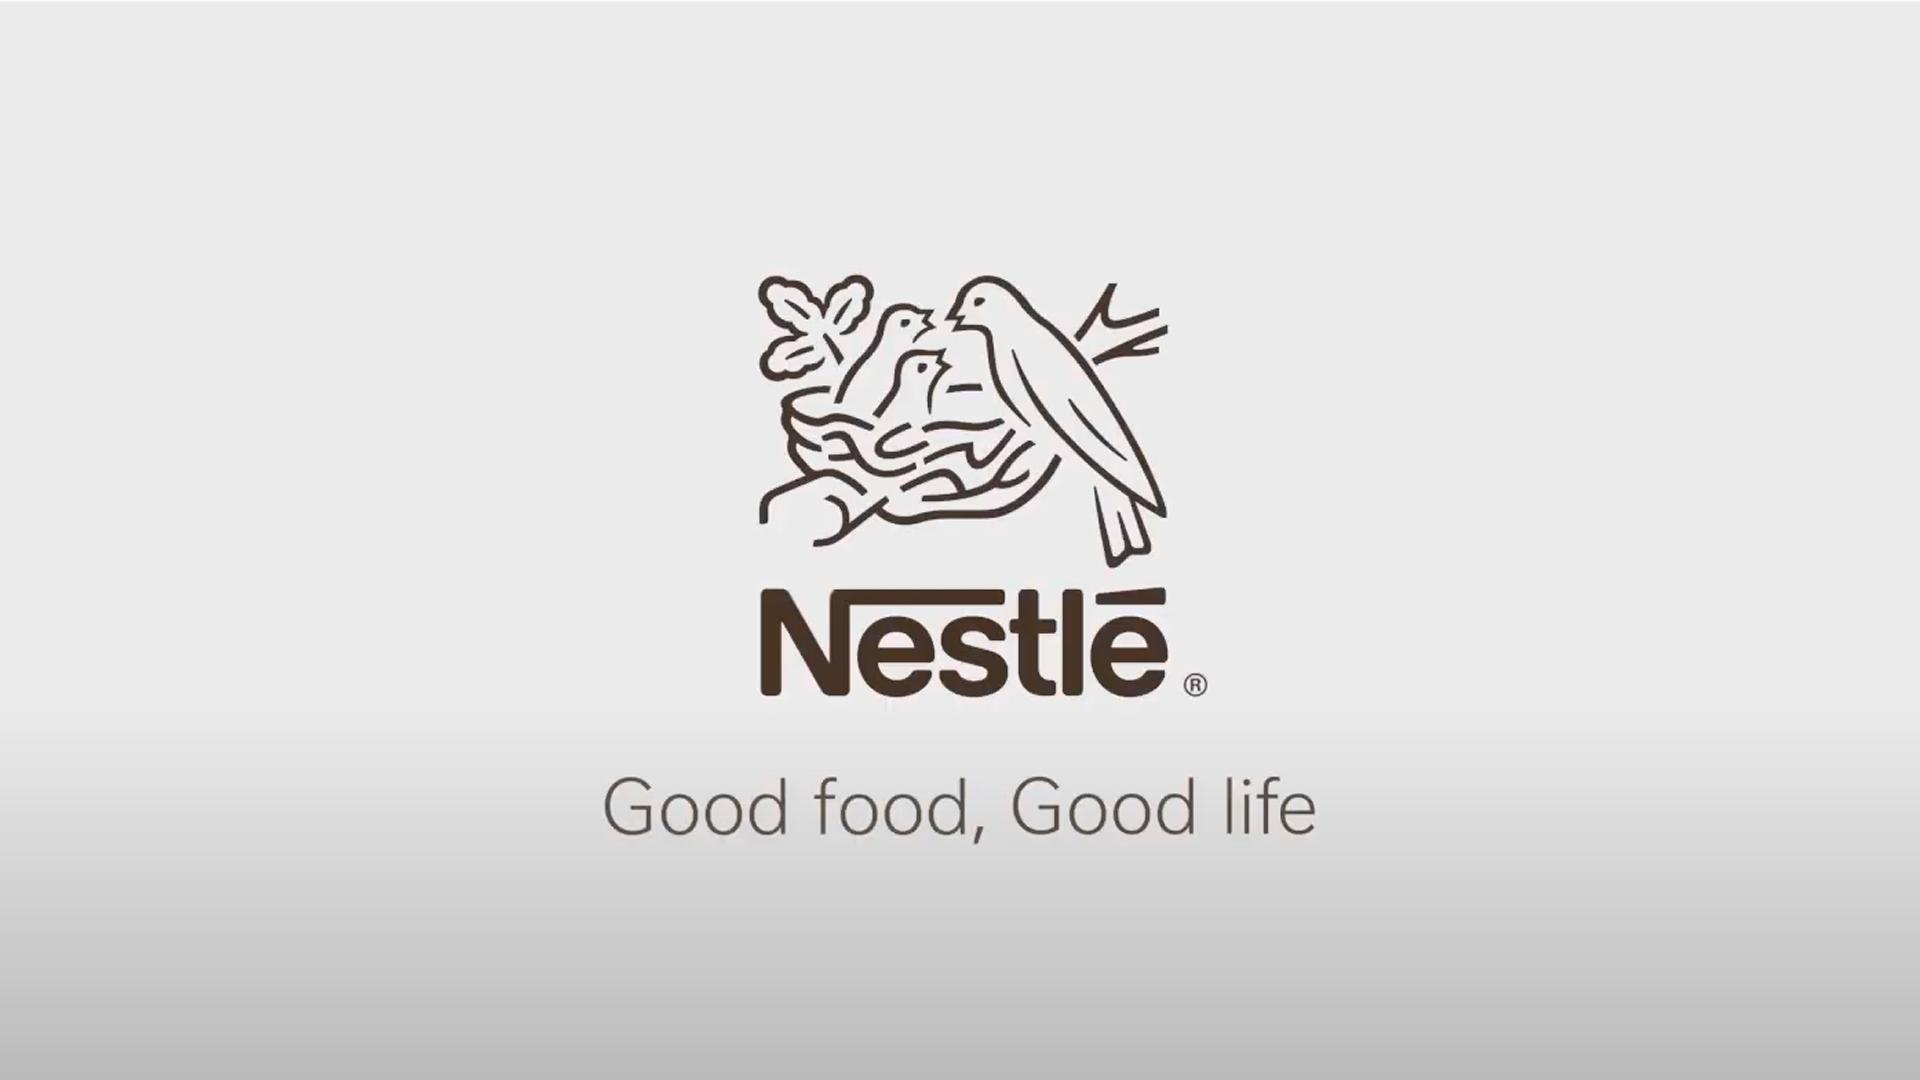 nestle good food good life